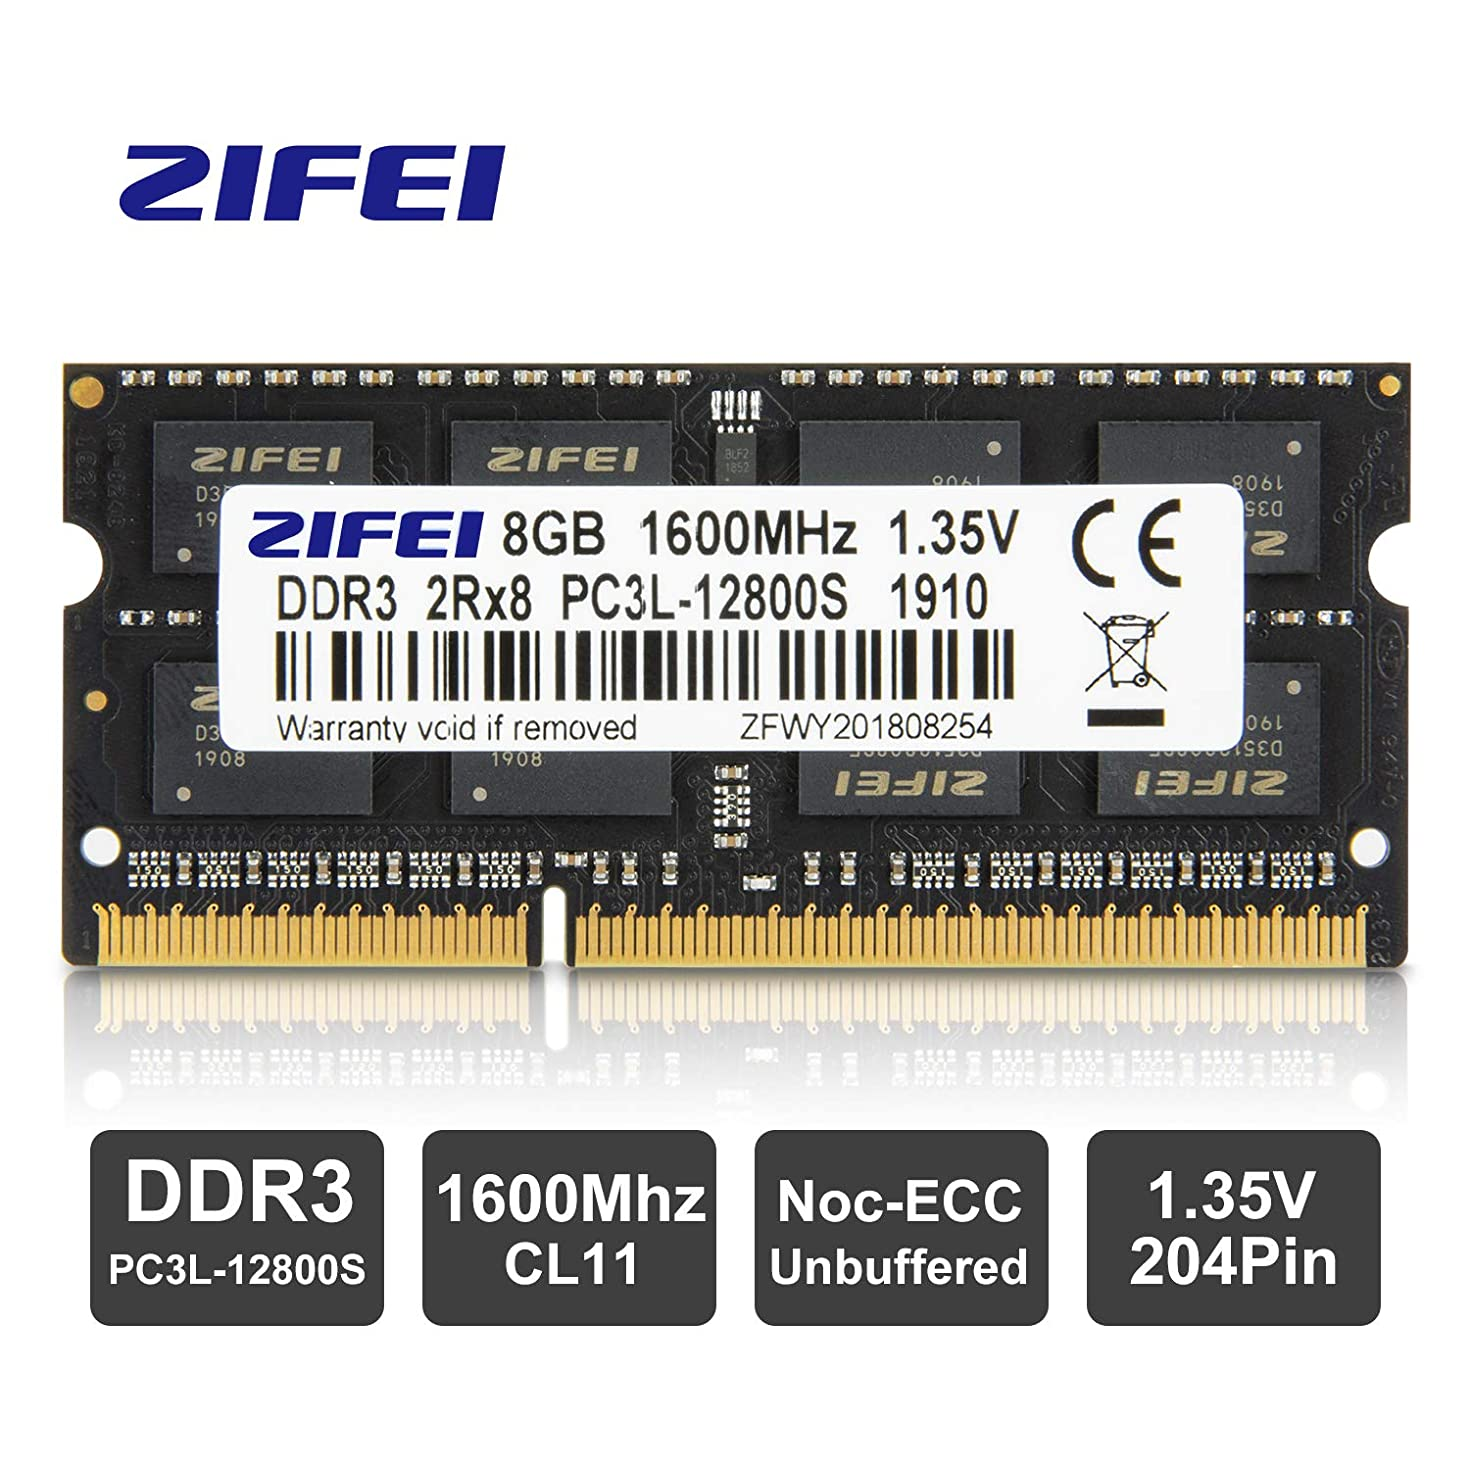 ZIFEI ram Memory 8GB (1 x 8GB),DDR3 PC3L-12800,1600MHz 2Rx8 CL11 204-Pin SODIMM Module for laptops